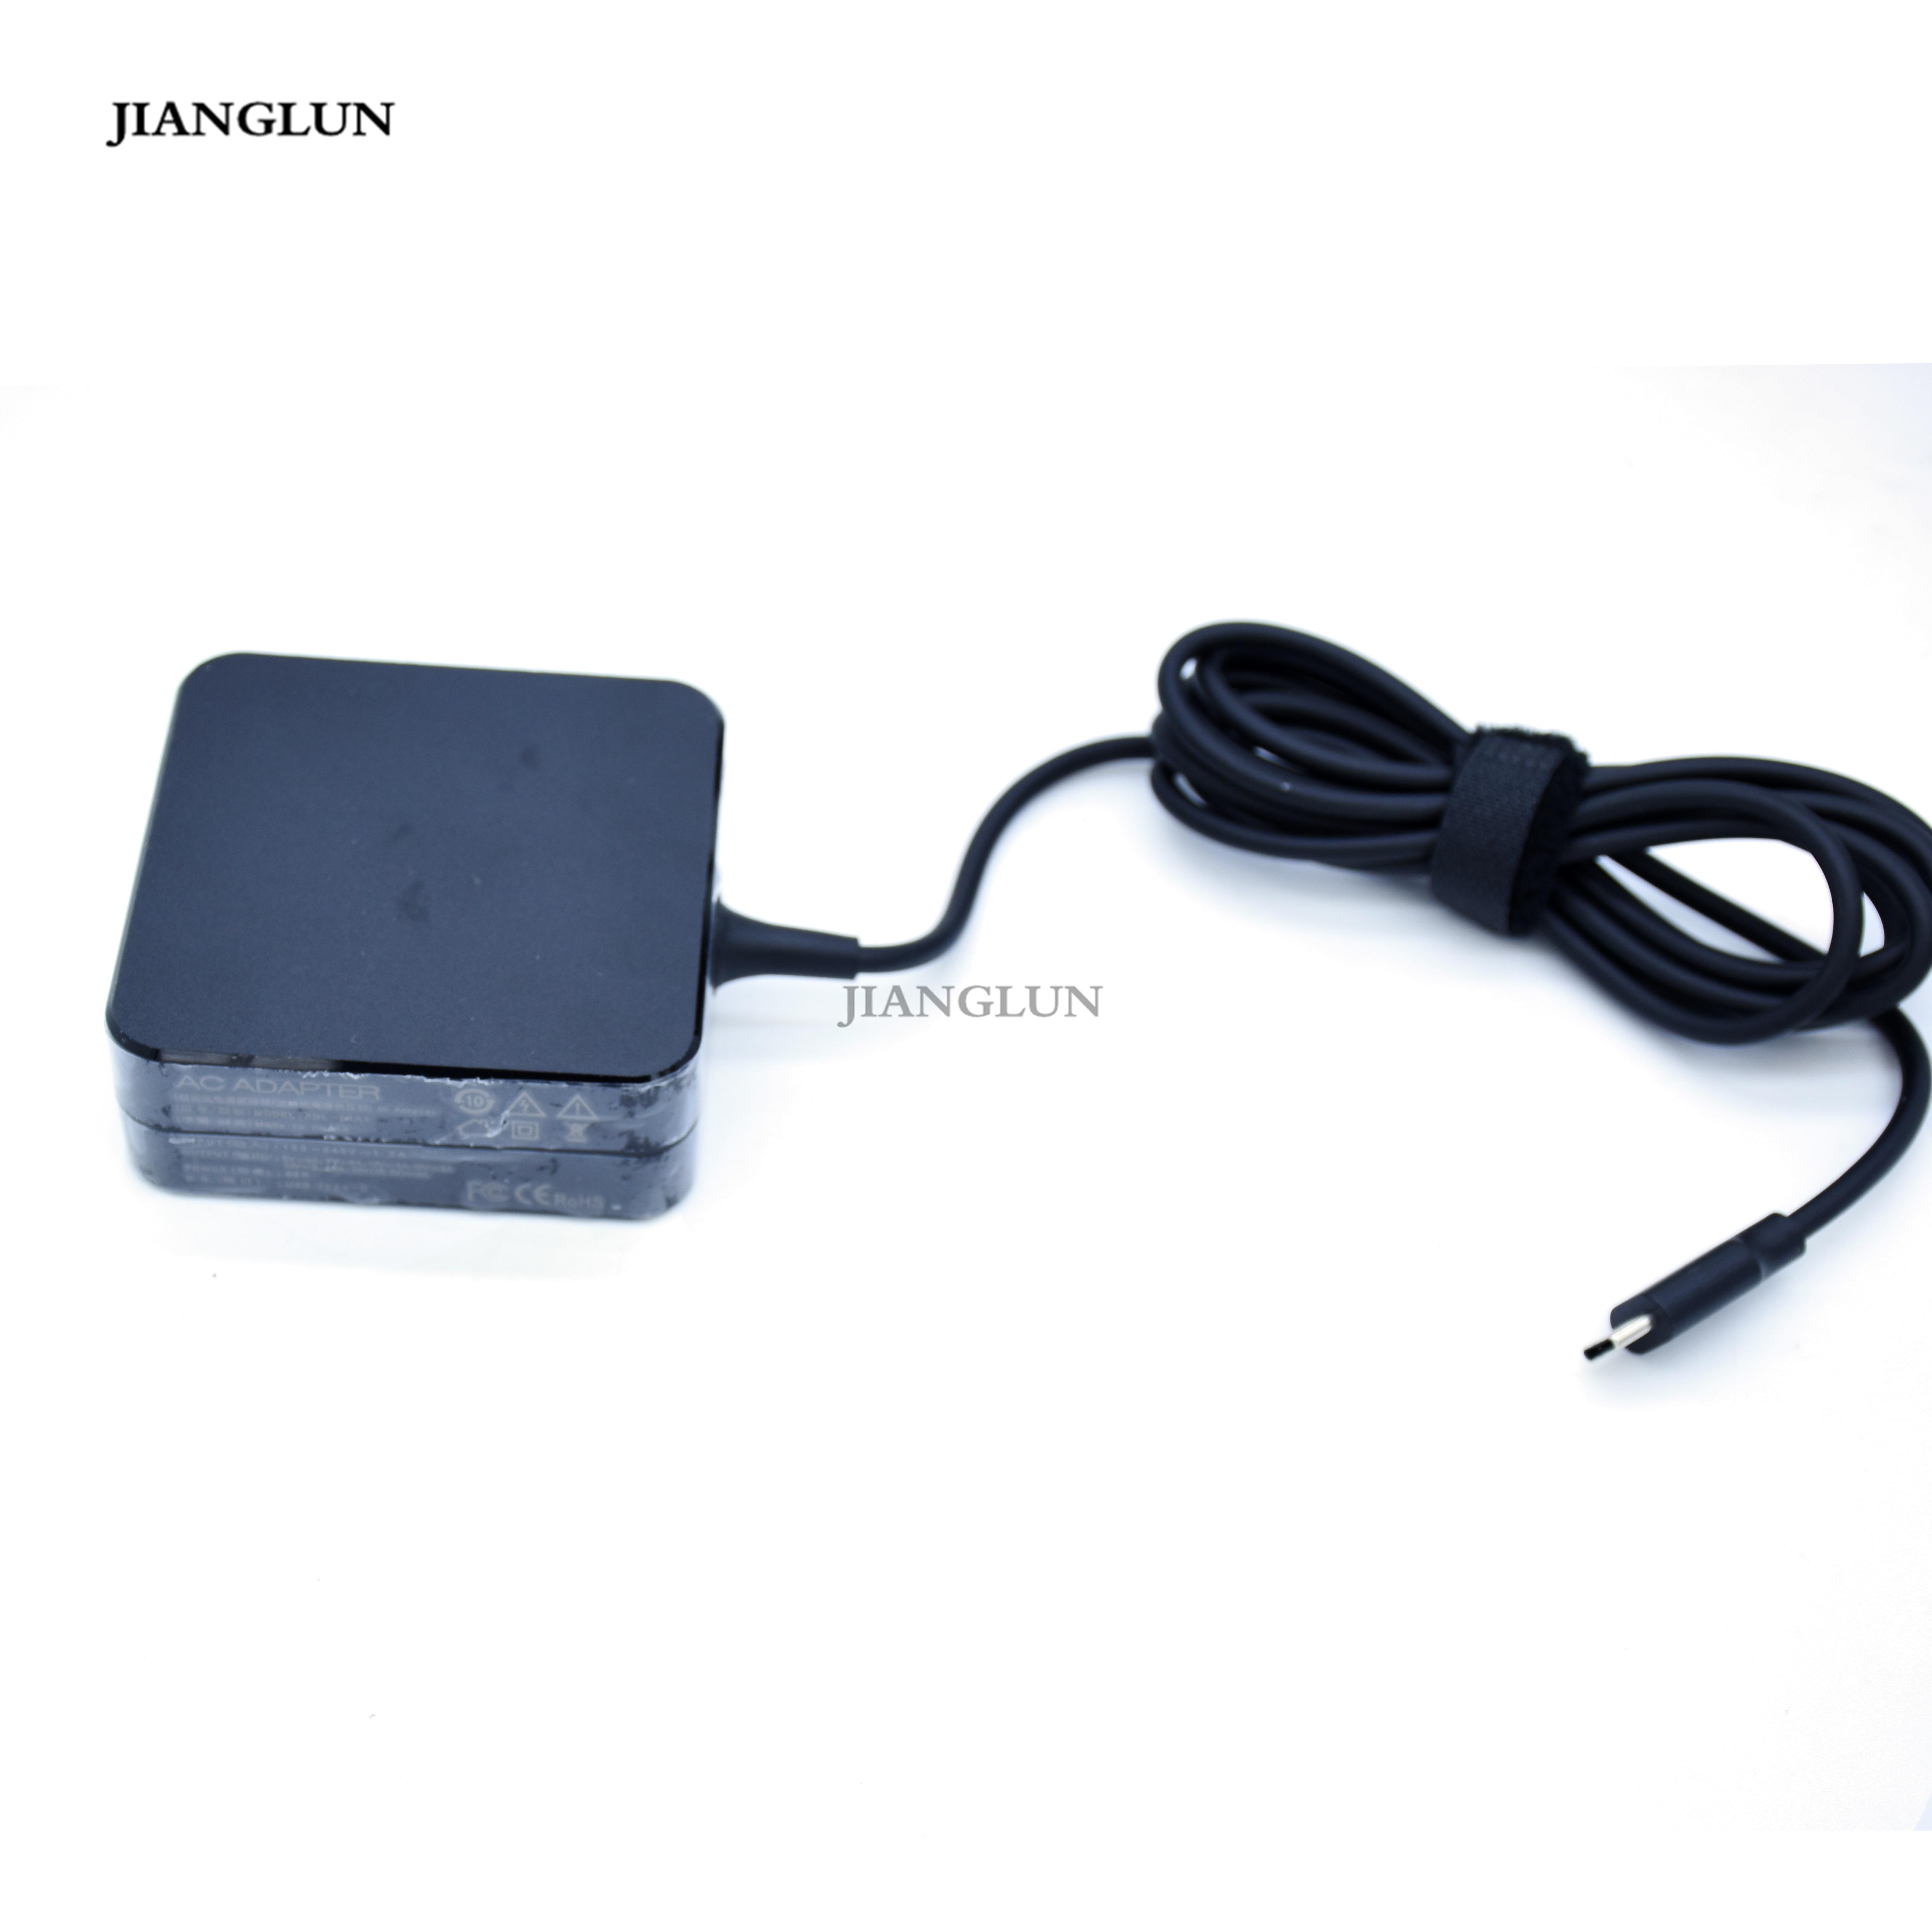 JIANGLUN Laptop USBC Charger For HP Spectre X360 Convertible 13-ae054TU